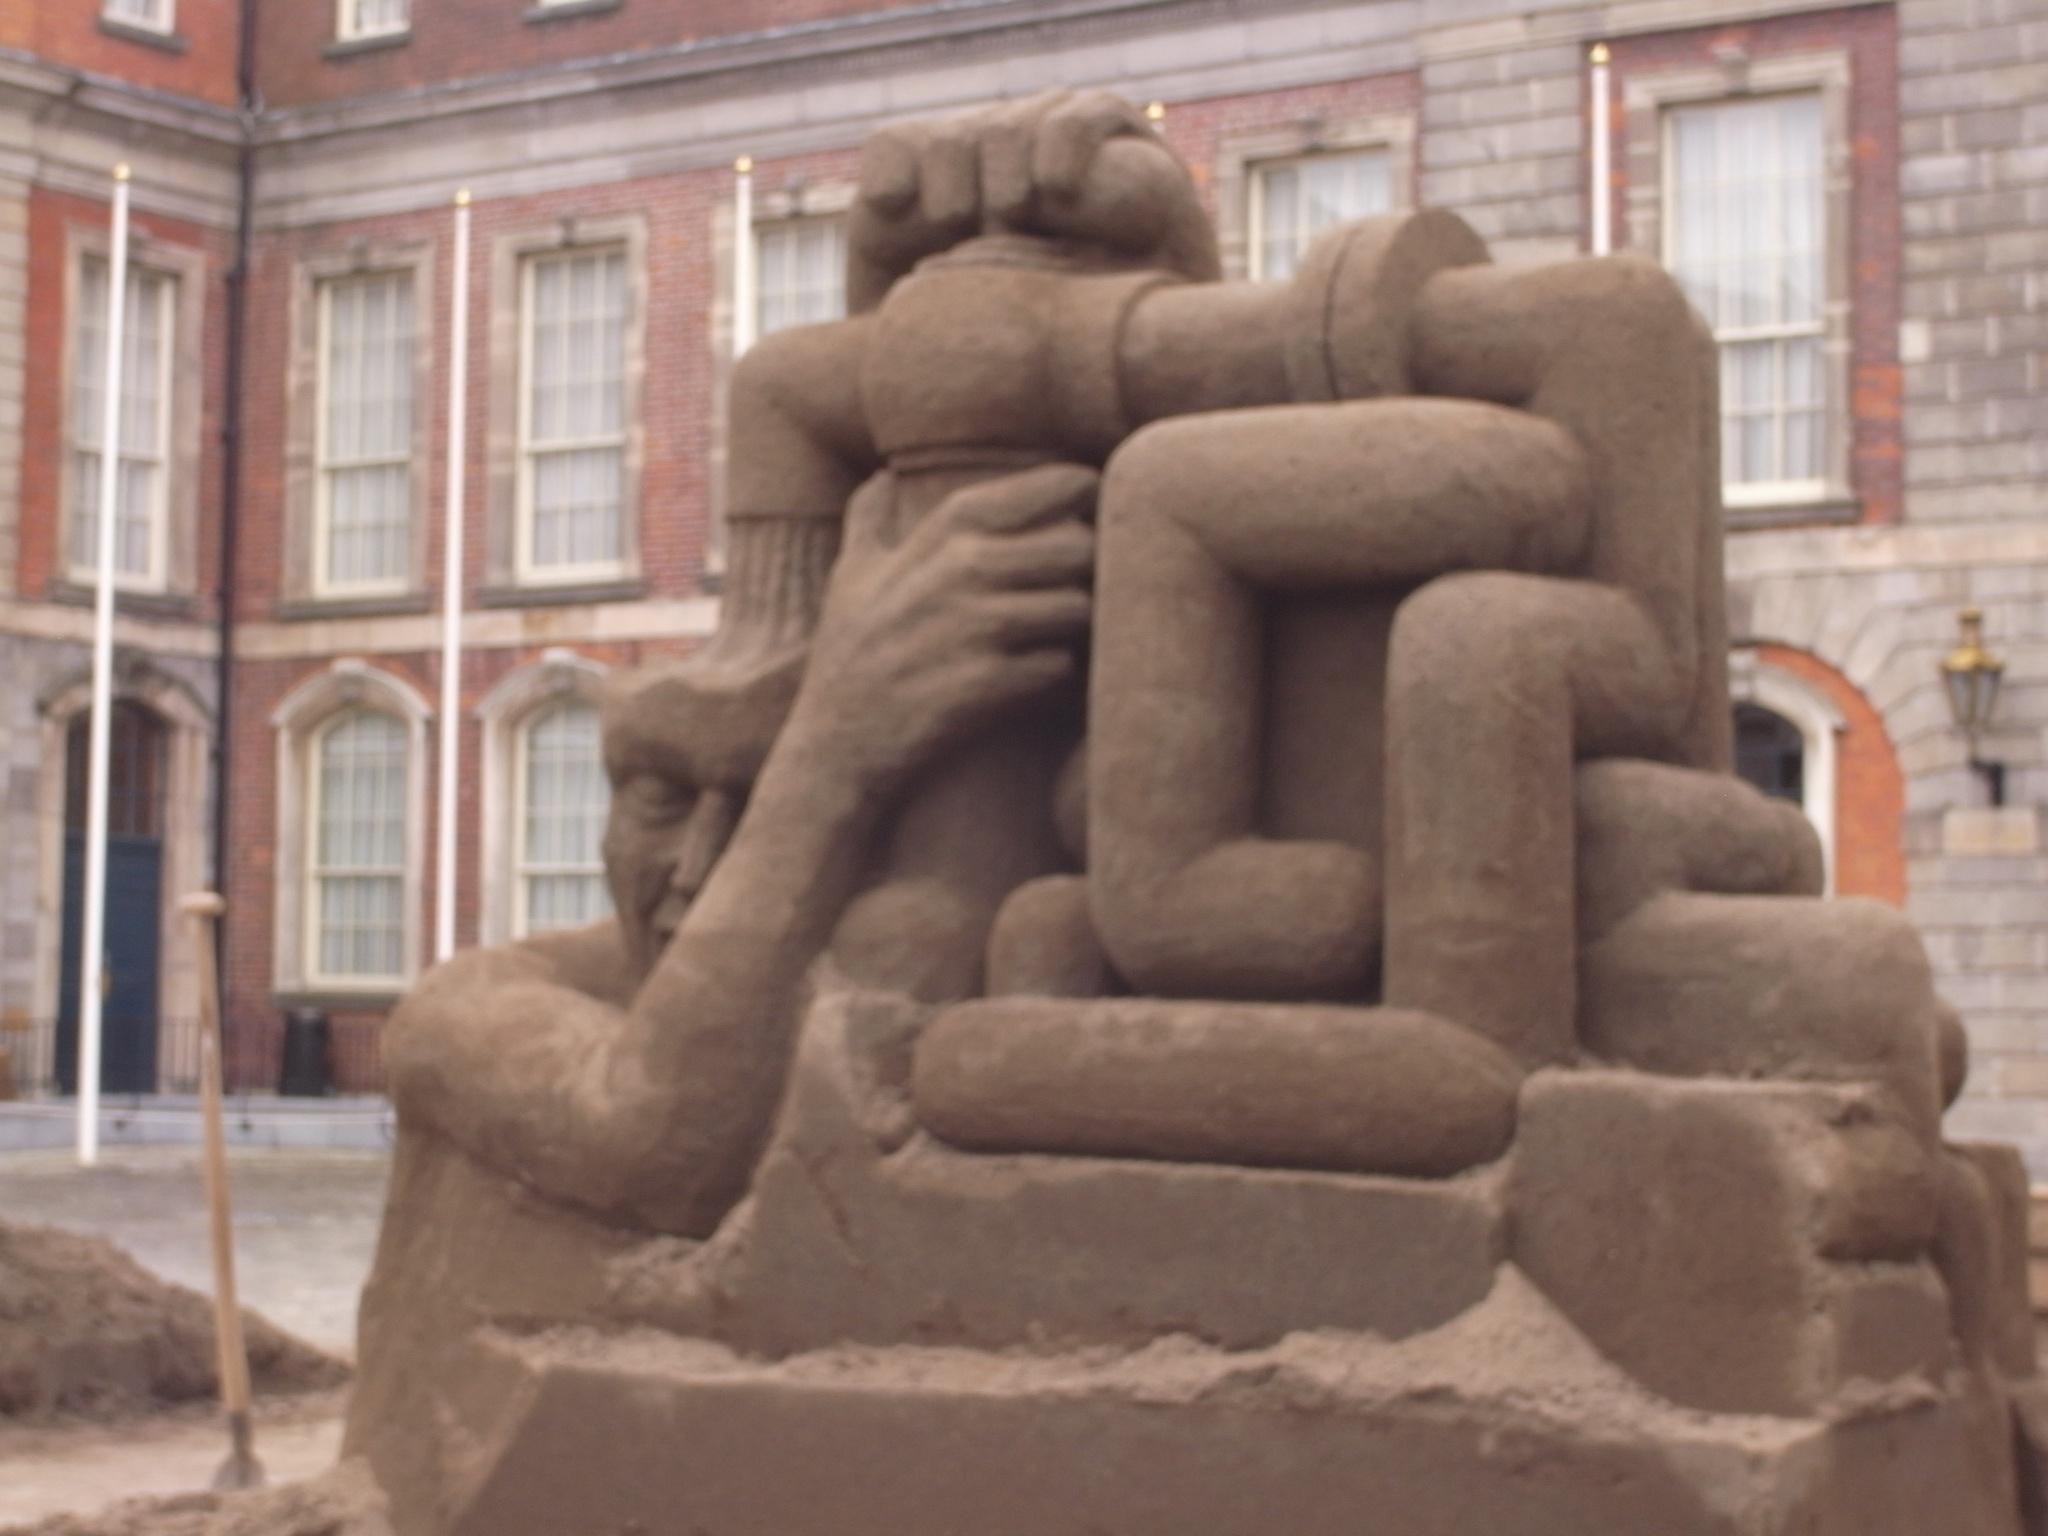 Escultura de arena. Castillo de Dublín. by carmina.waterstone